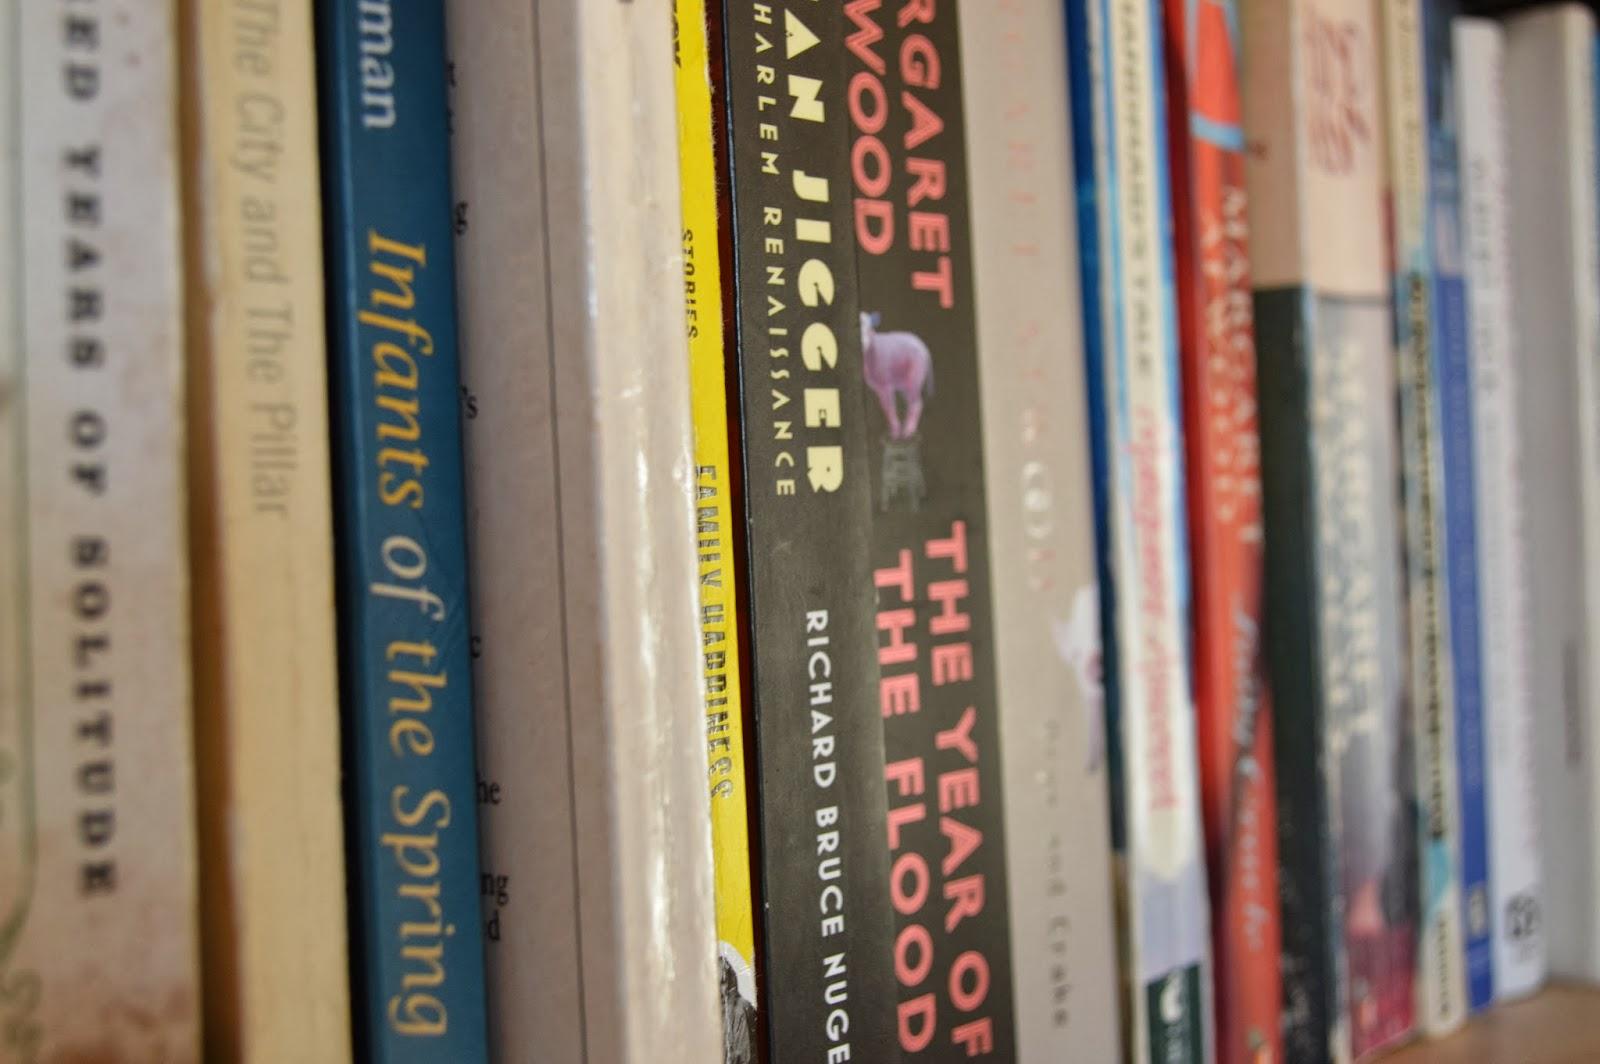 pretty, bookshelf, book & a cuppa, photography, photo, book spines, reading, bookcase, literature, colourful